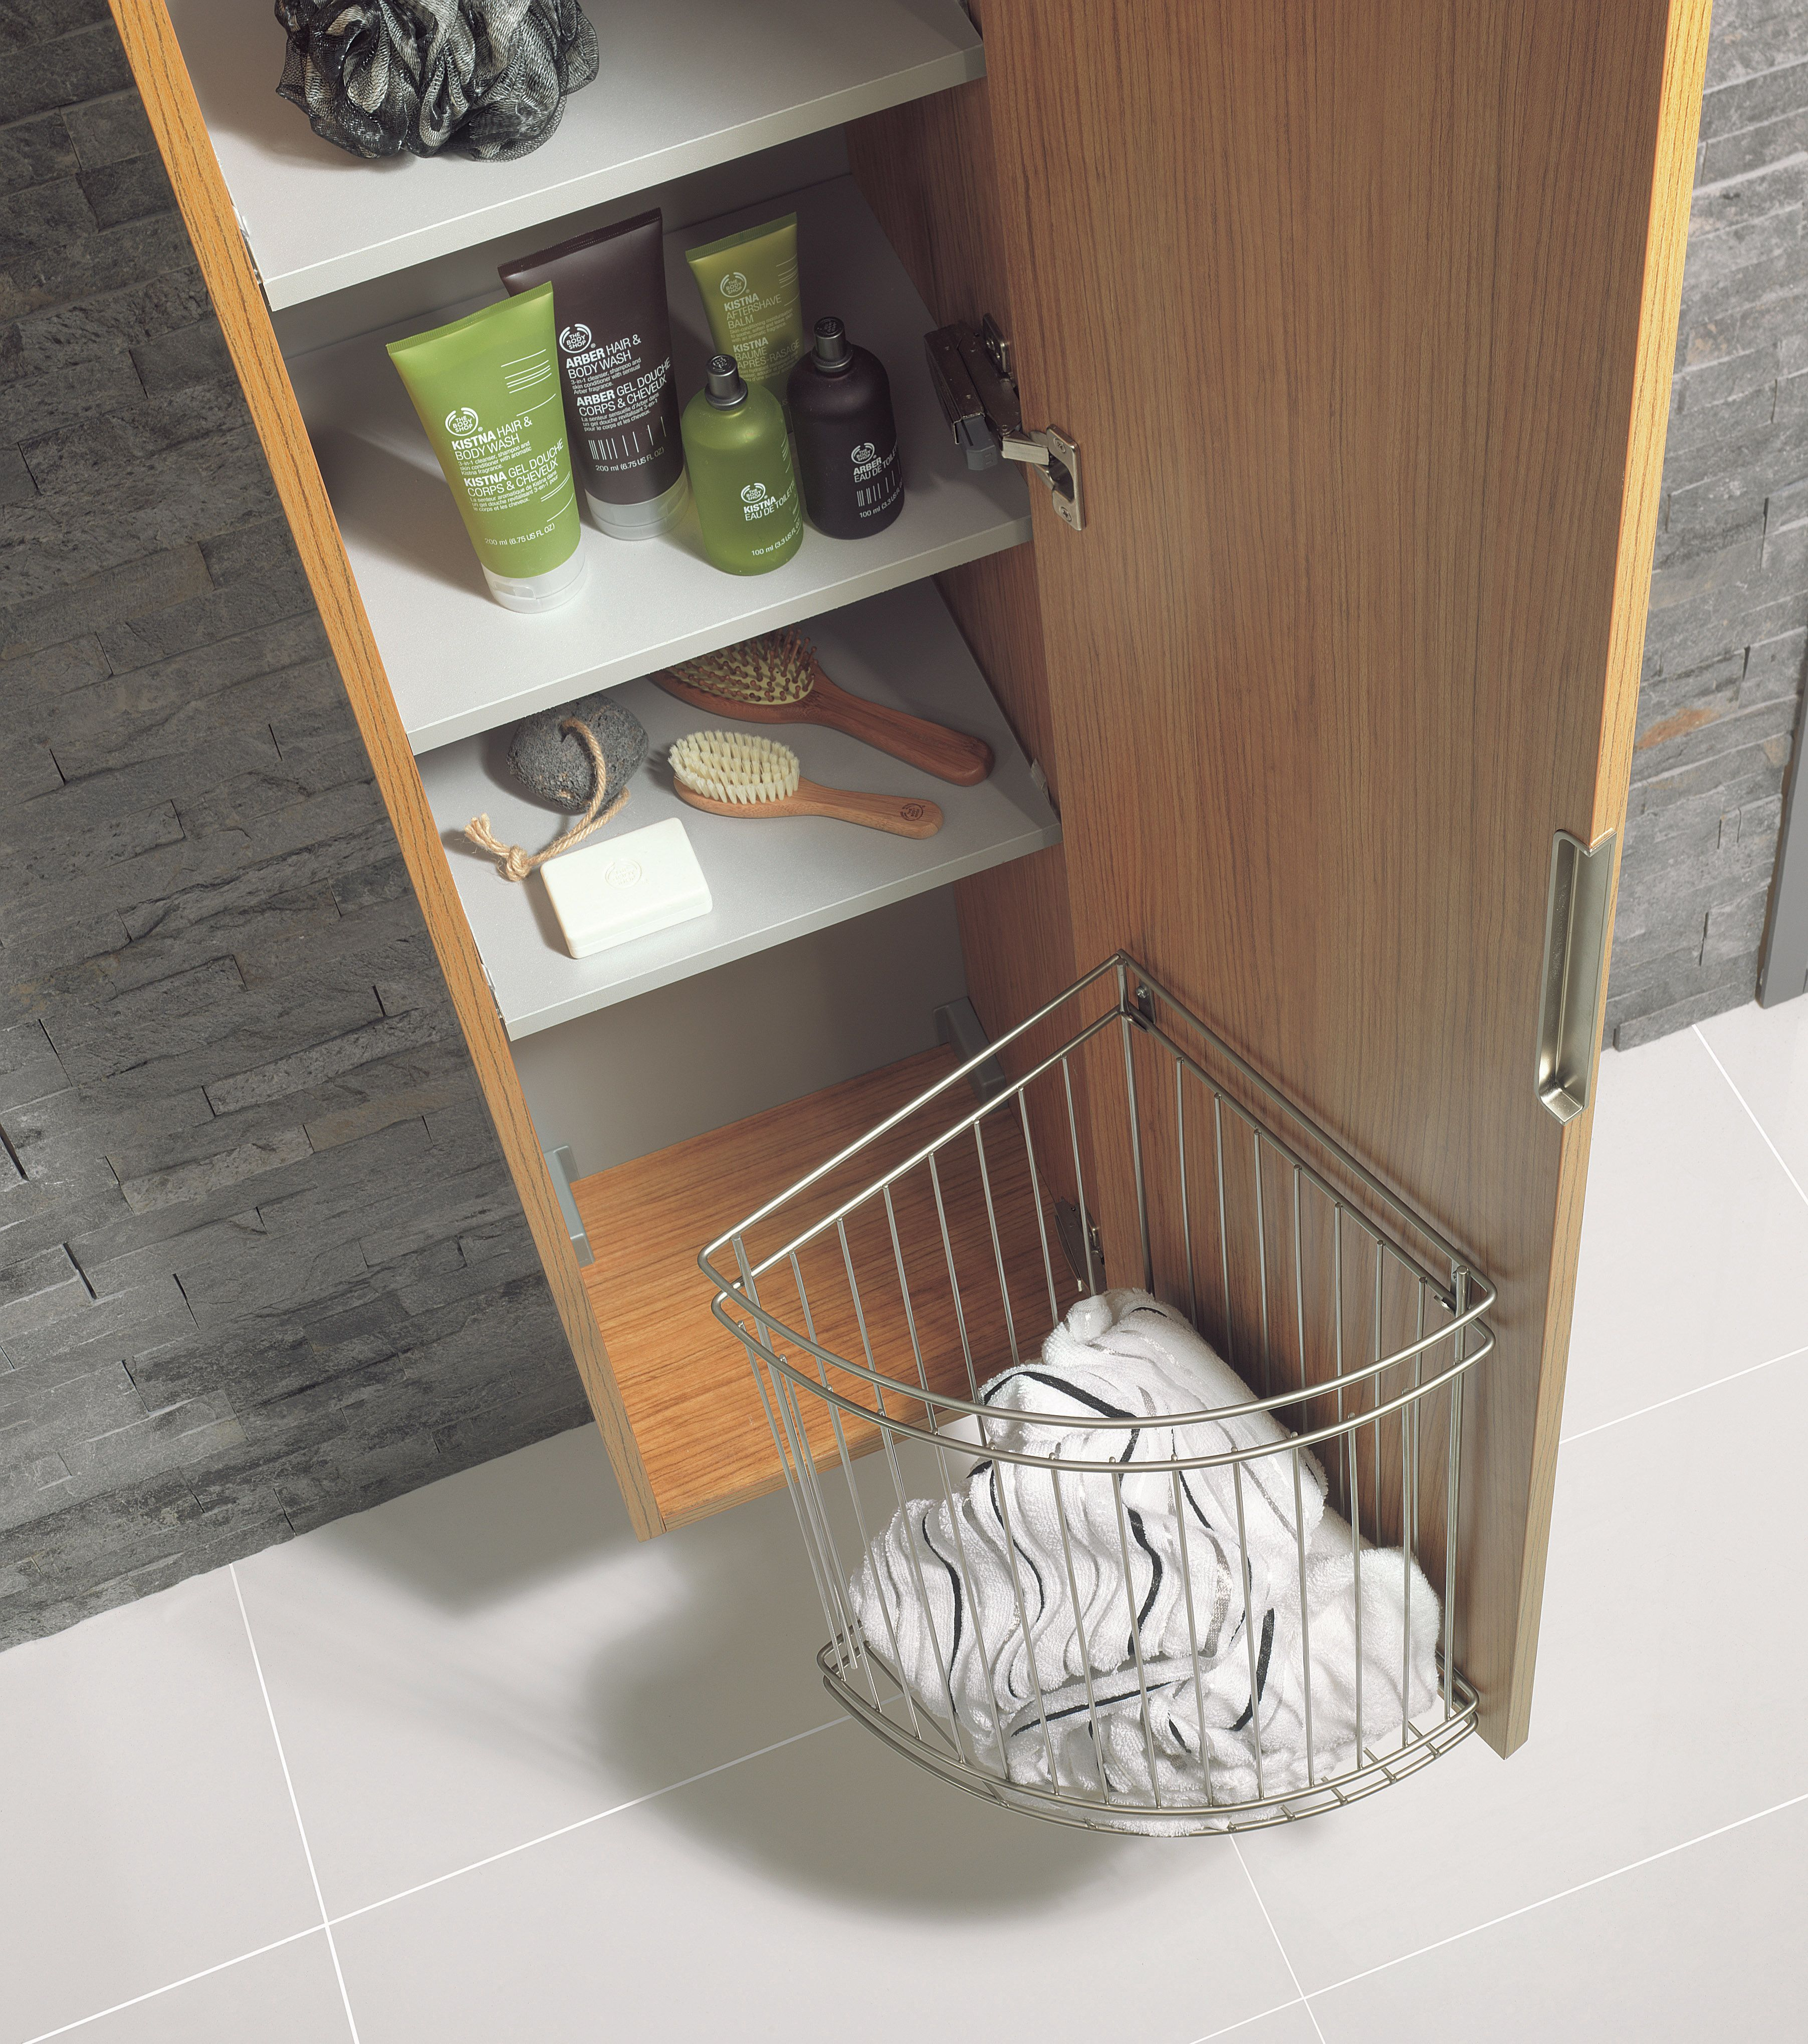 Linea teakwood bathroom furniture tower unit from crosswater